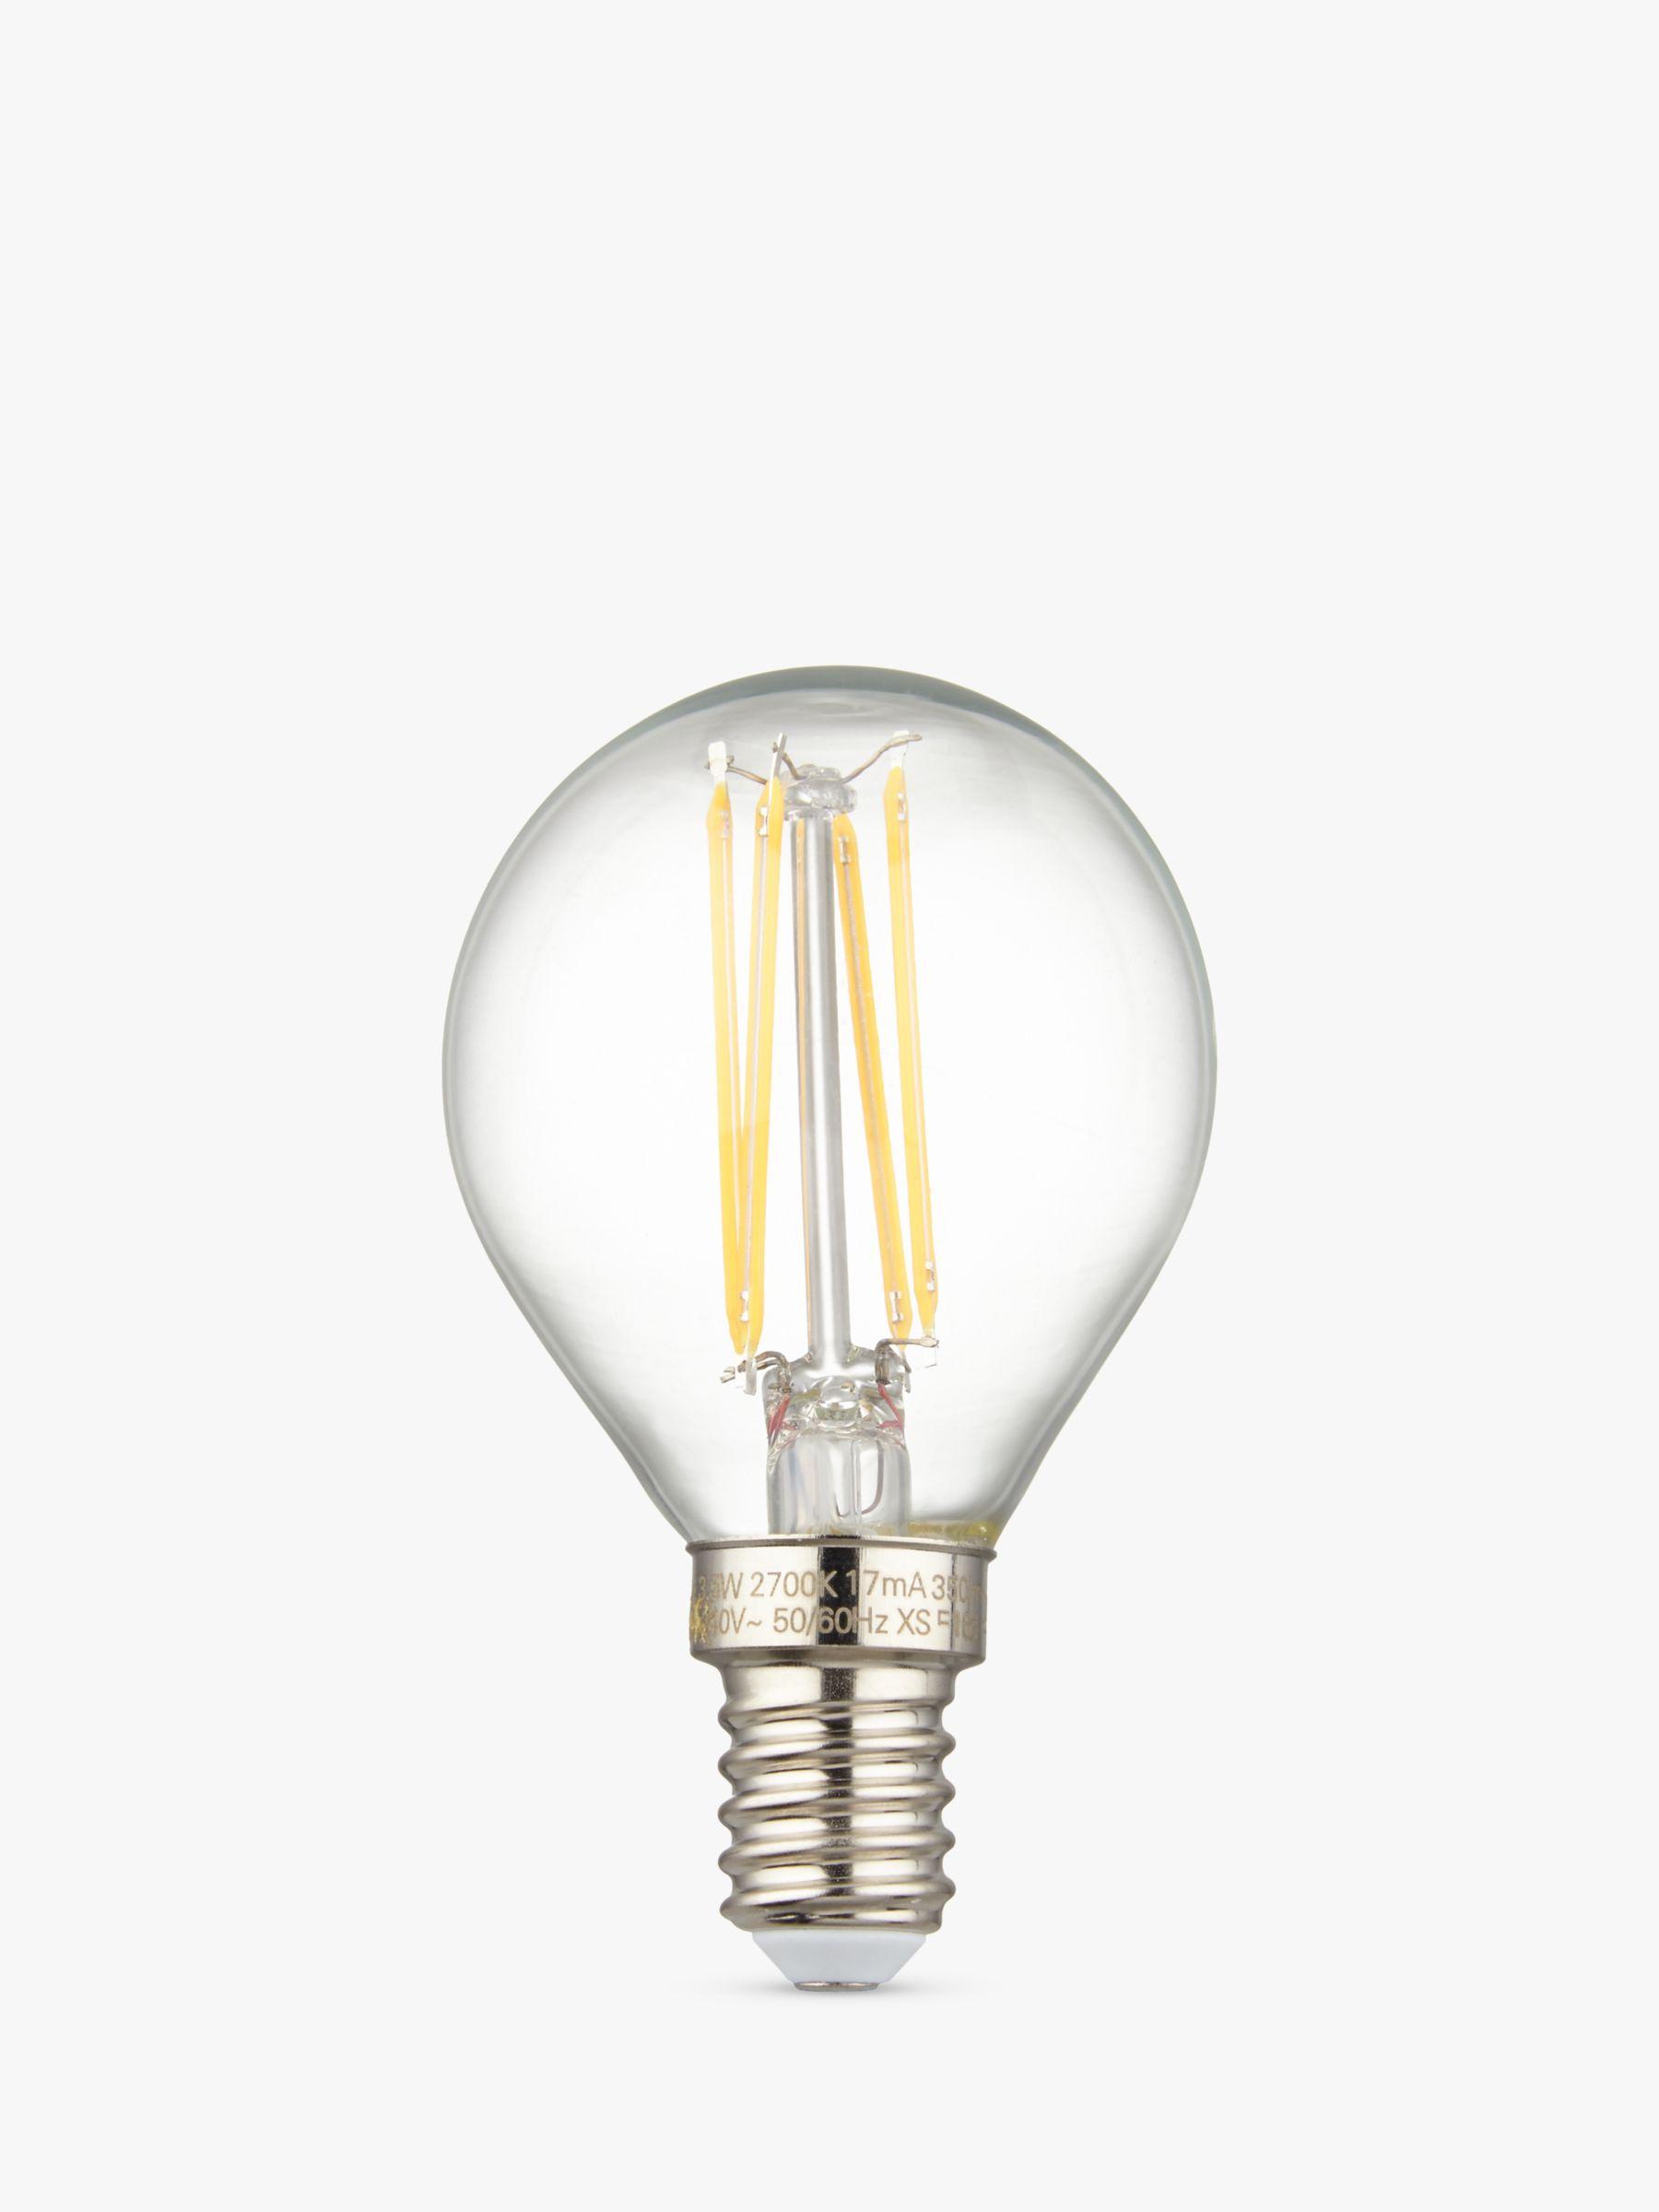 Calex Calex 3.5W SES LED Filament Golf Ball Bulb, Clear